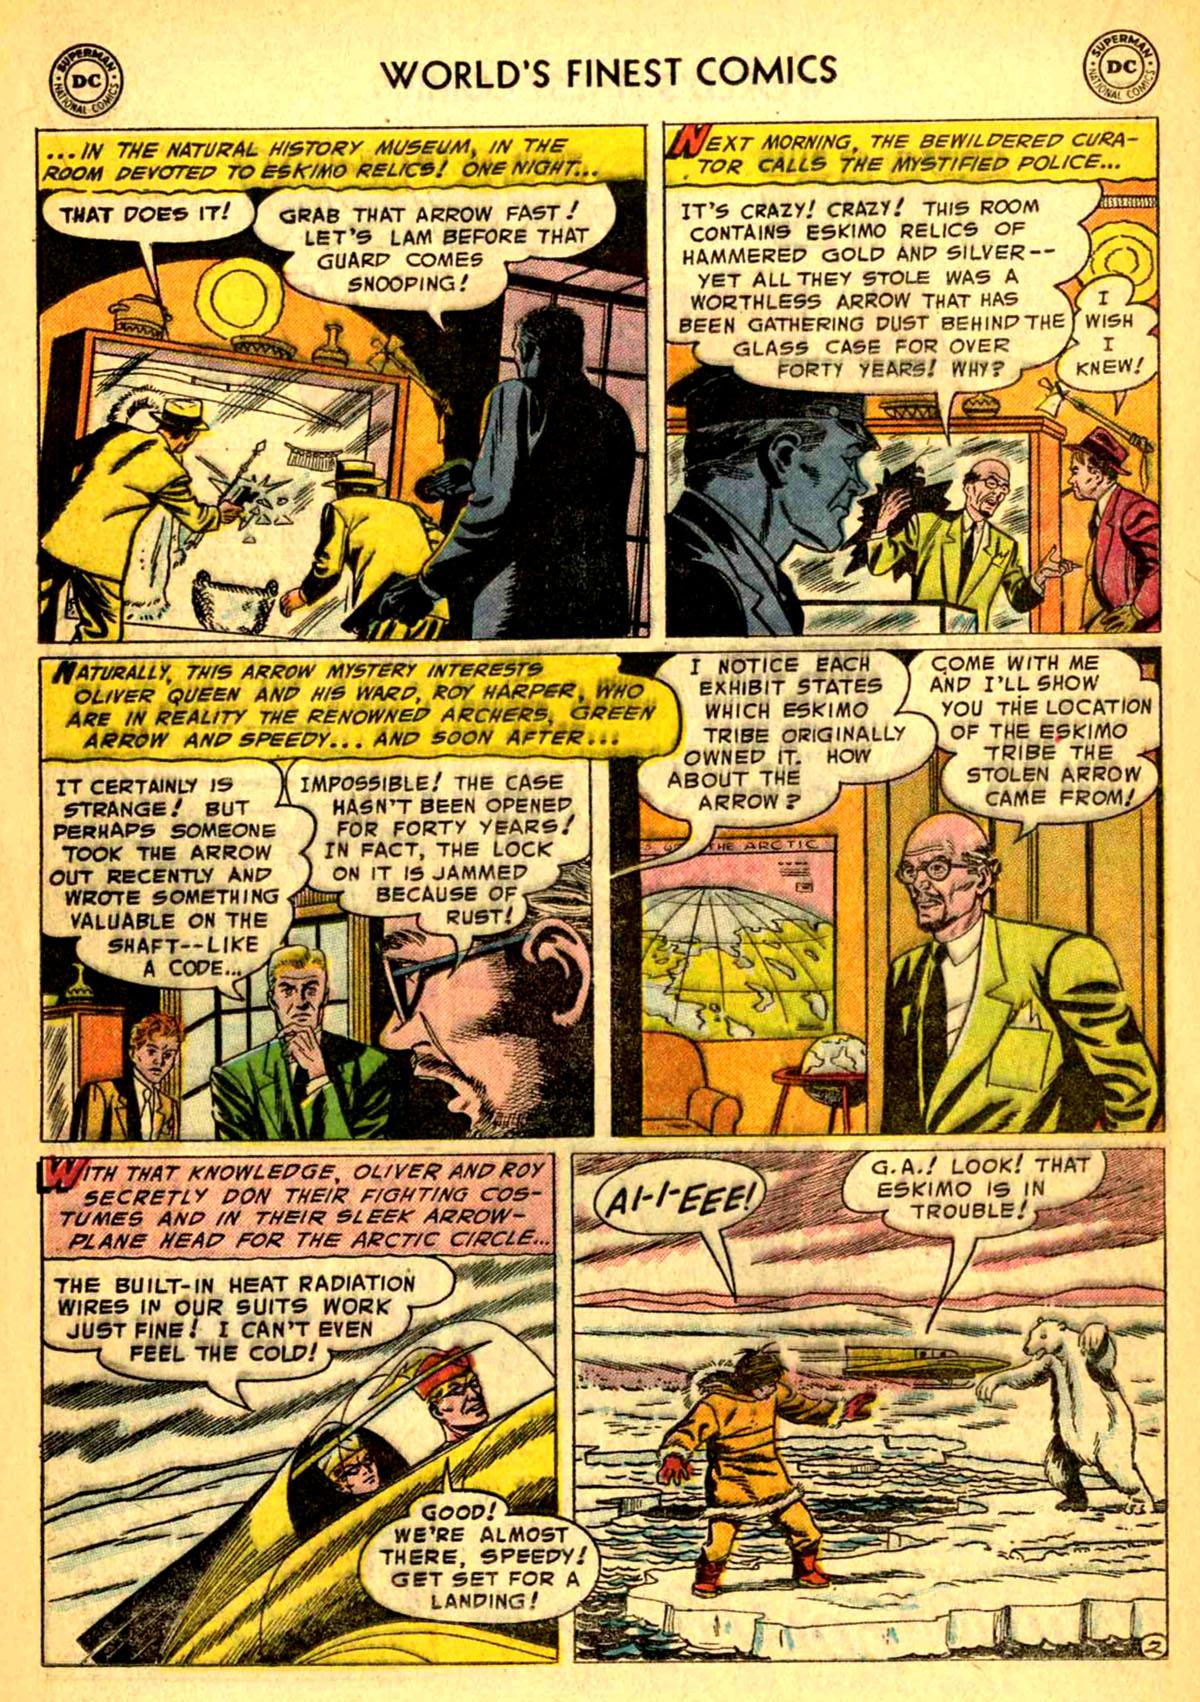 Read online World's Finest Comics comic -  Issue #77 - 18